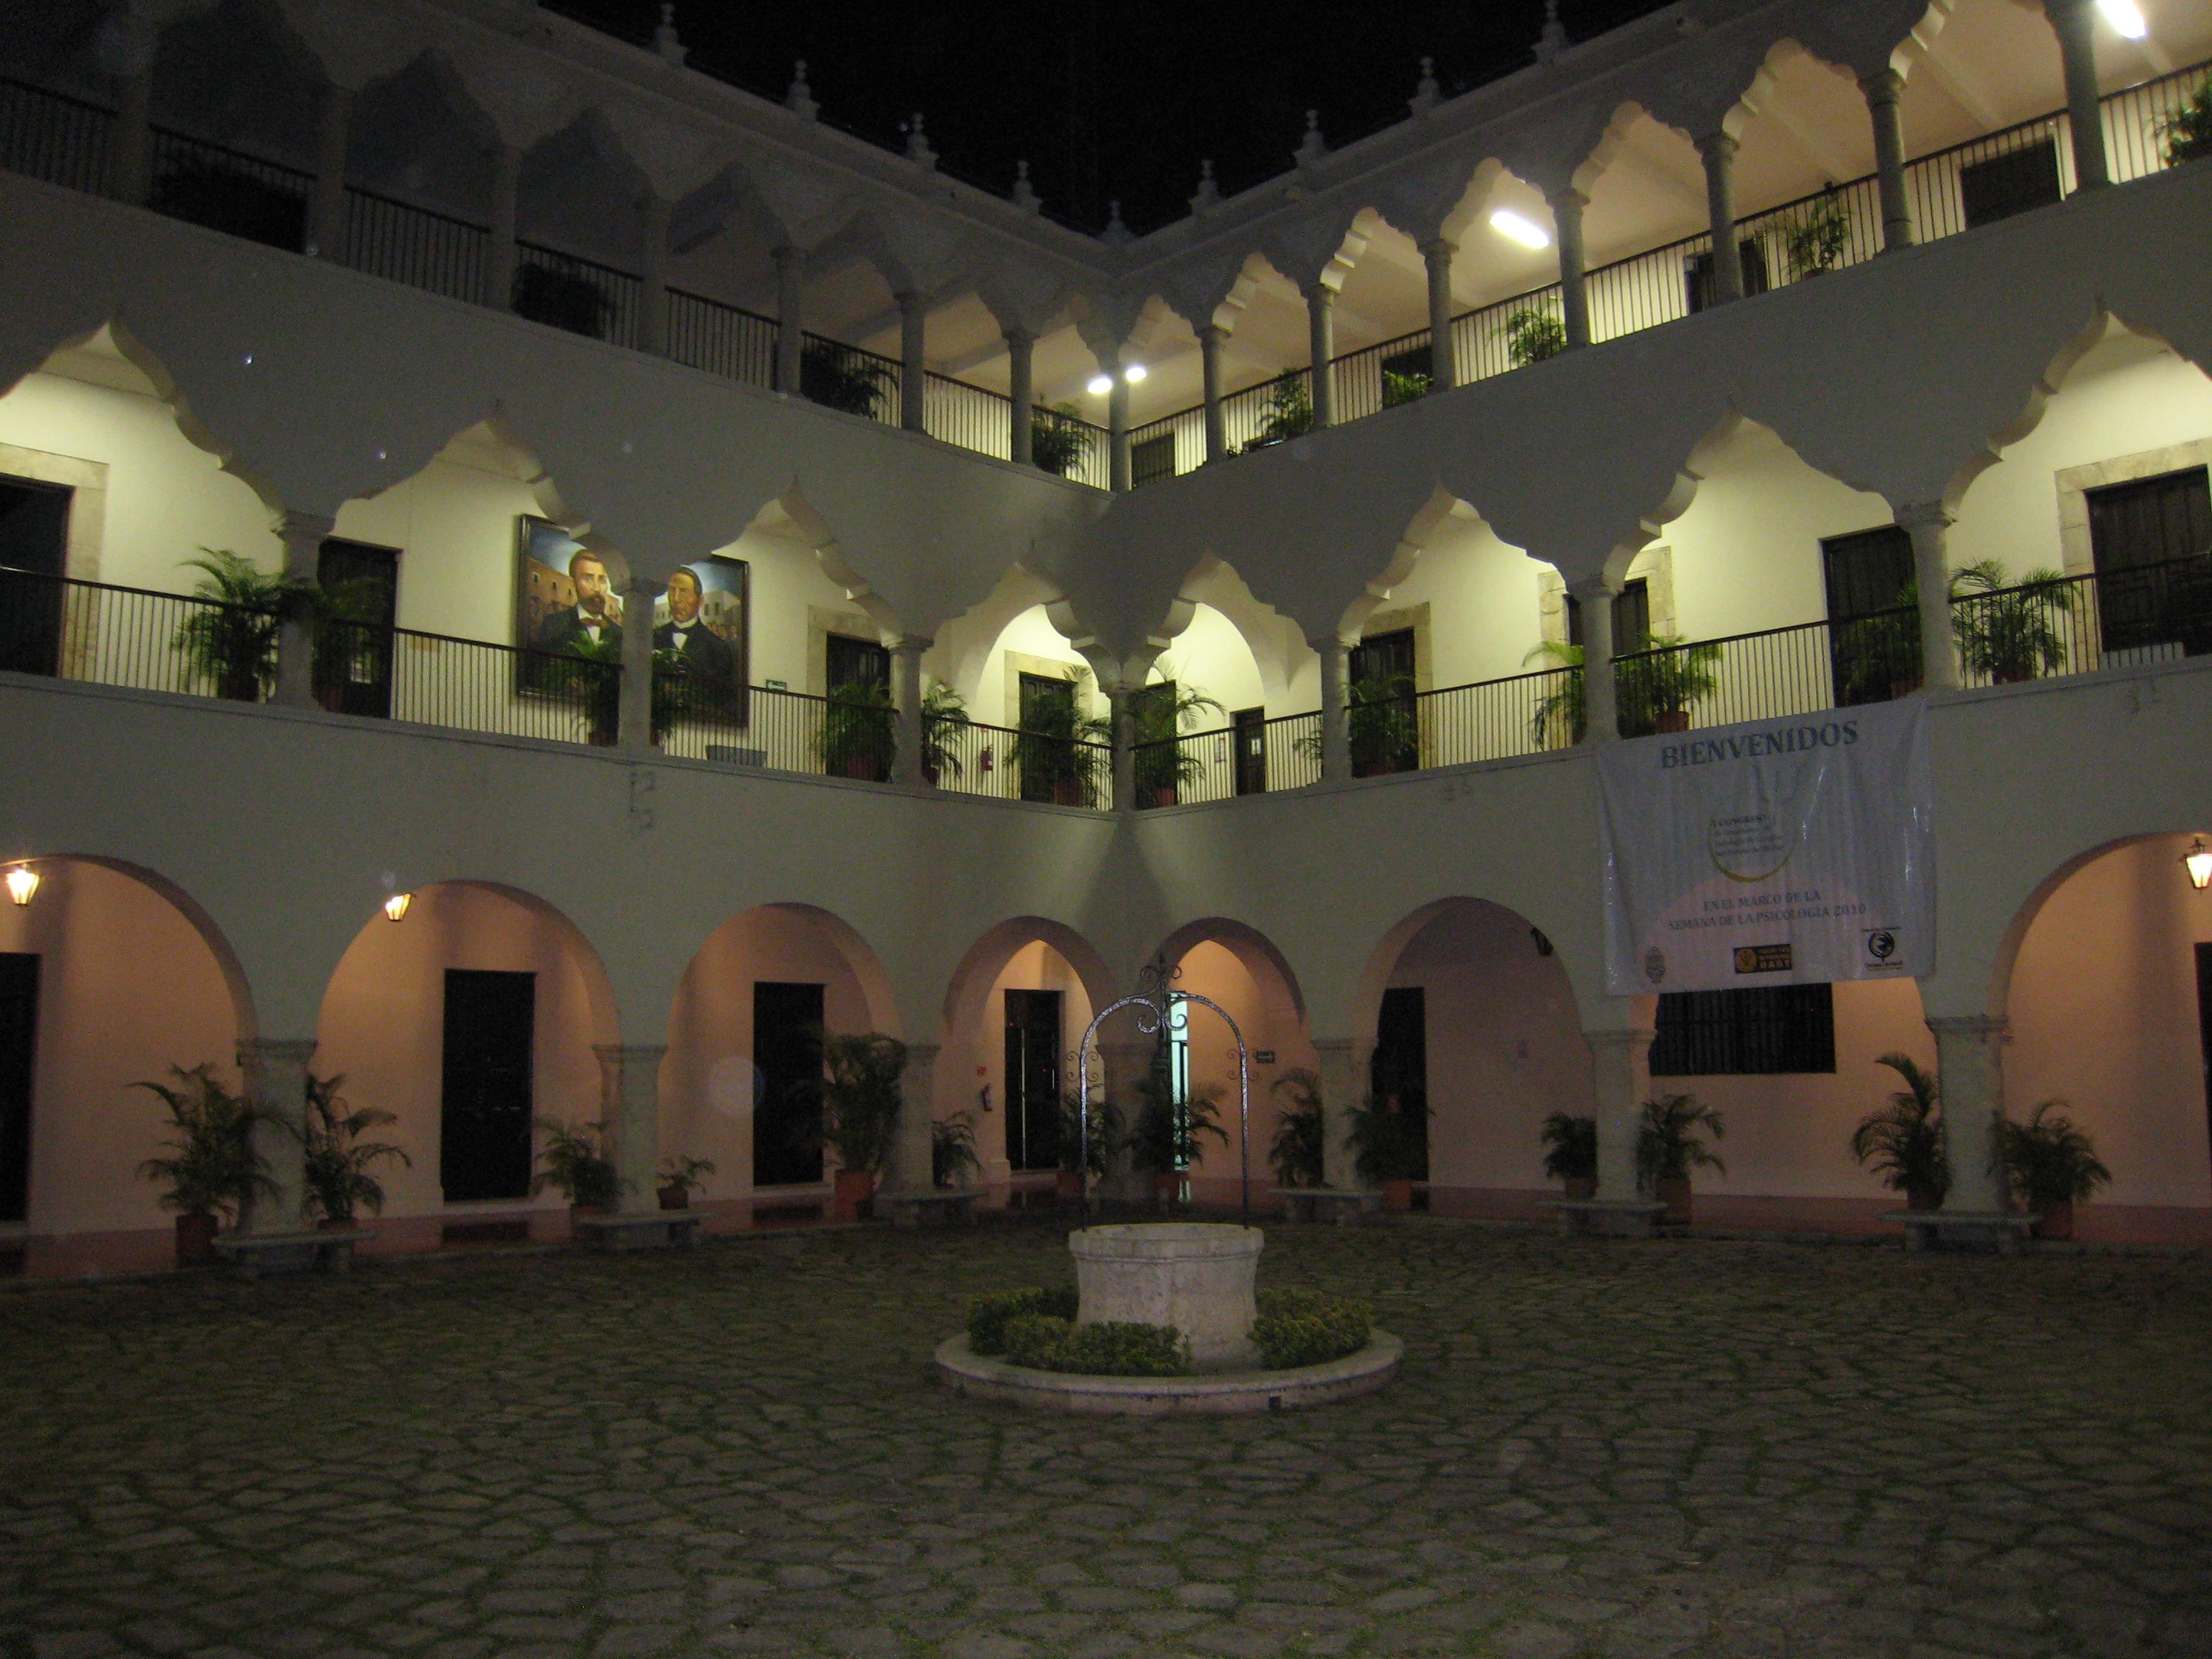 Mexico Vacation 2010: Merida (Part 1)